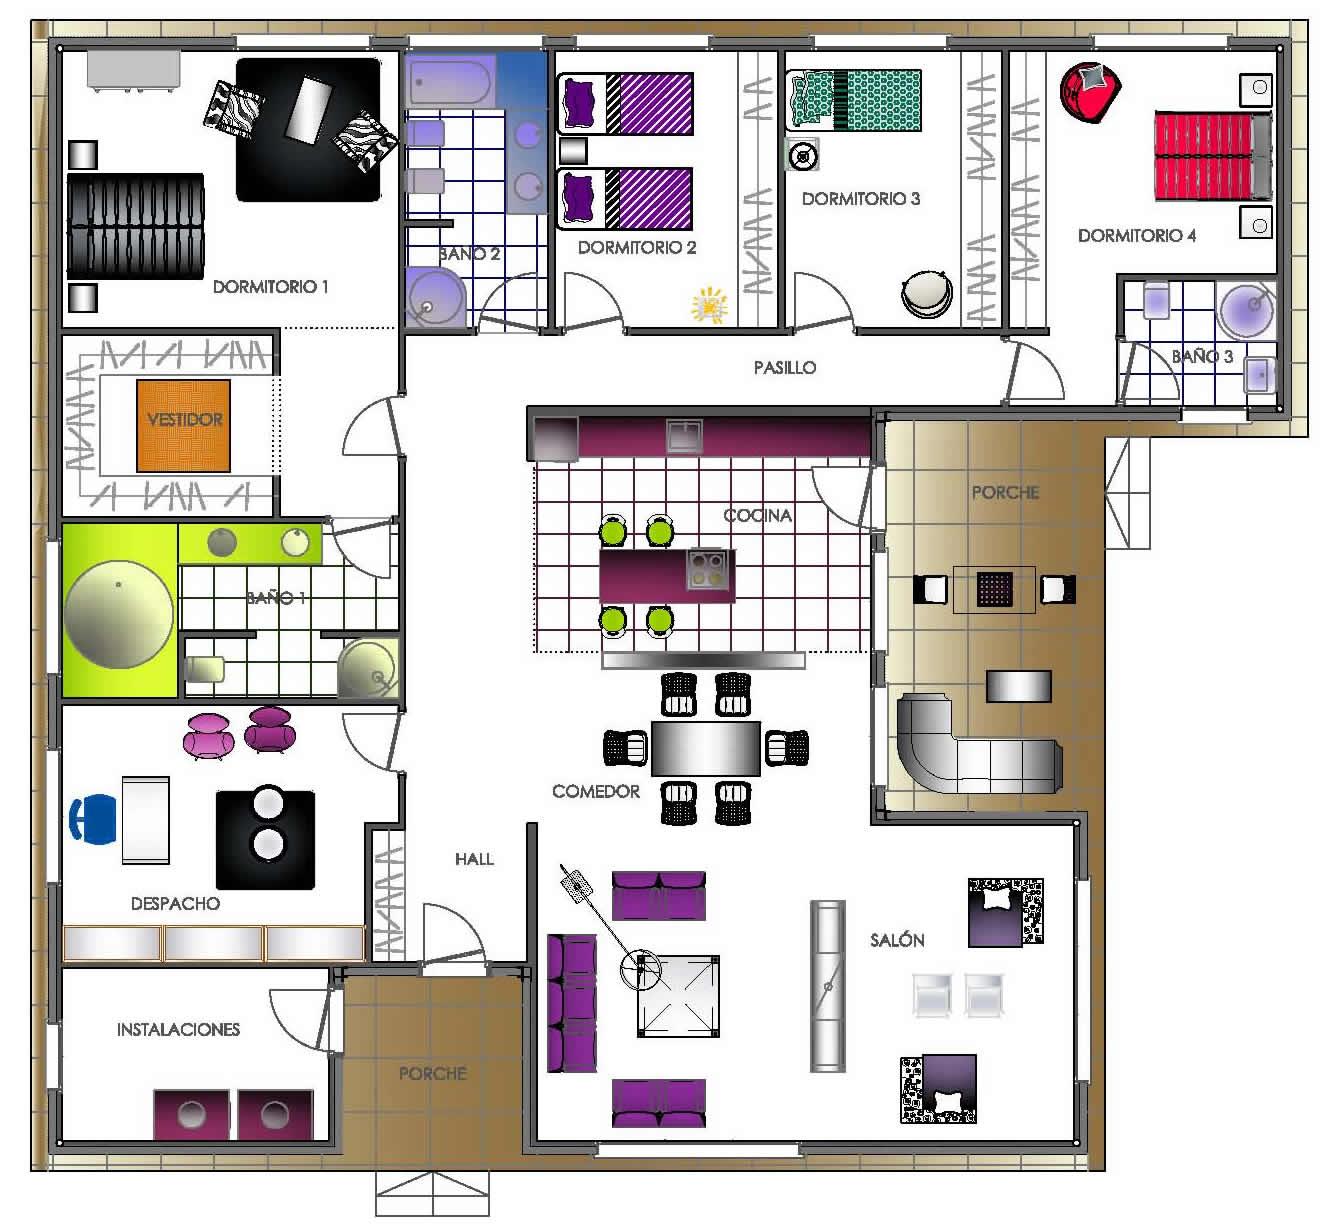 19 planos de casas 3 dormitorios planos y fachadas for Planos de casas de 3 pisos